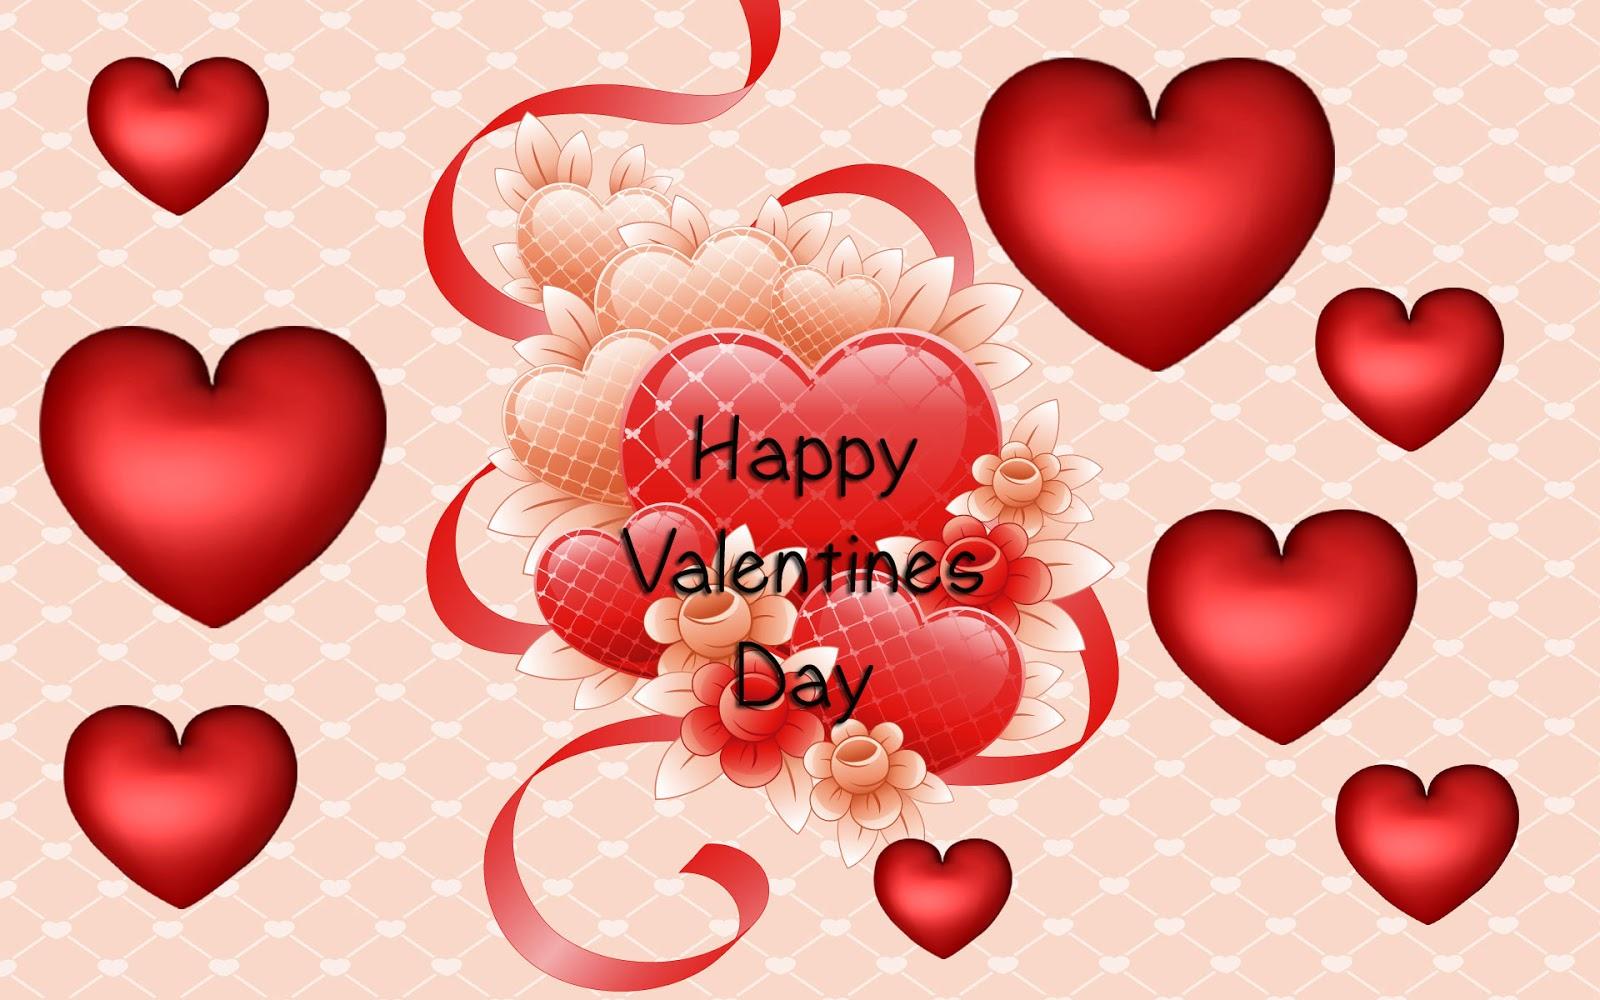 valentines day wallpaper photos 14th feb 2013